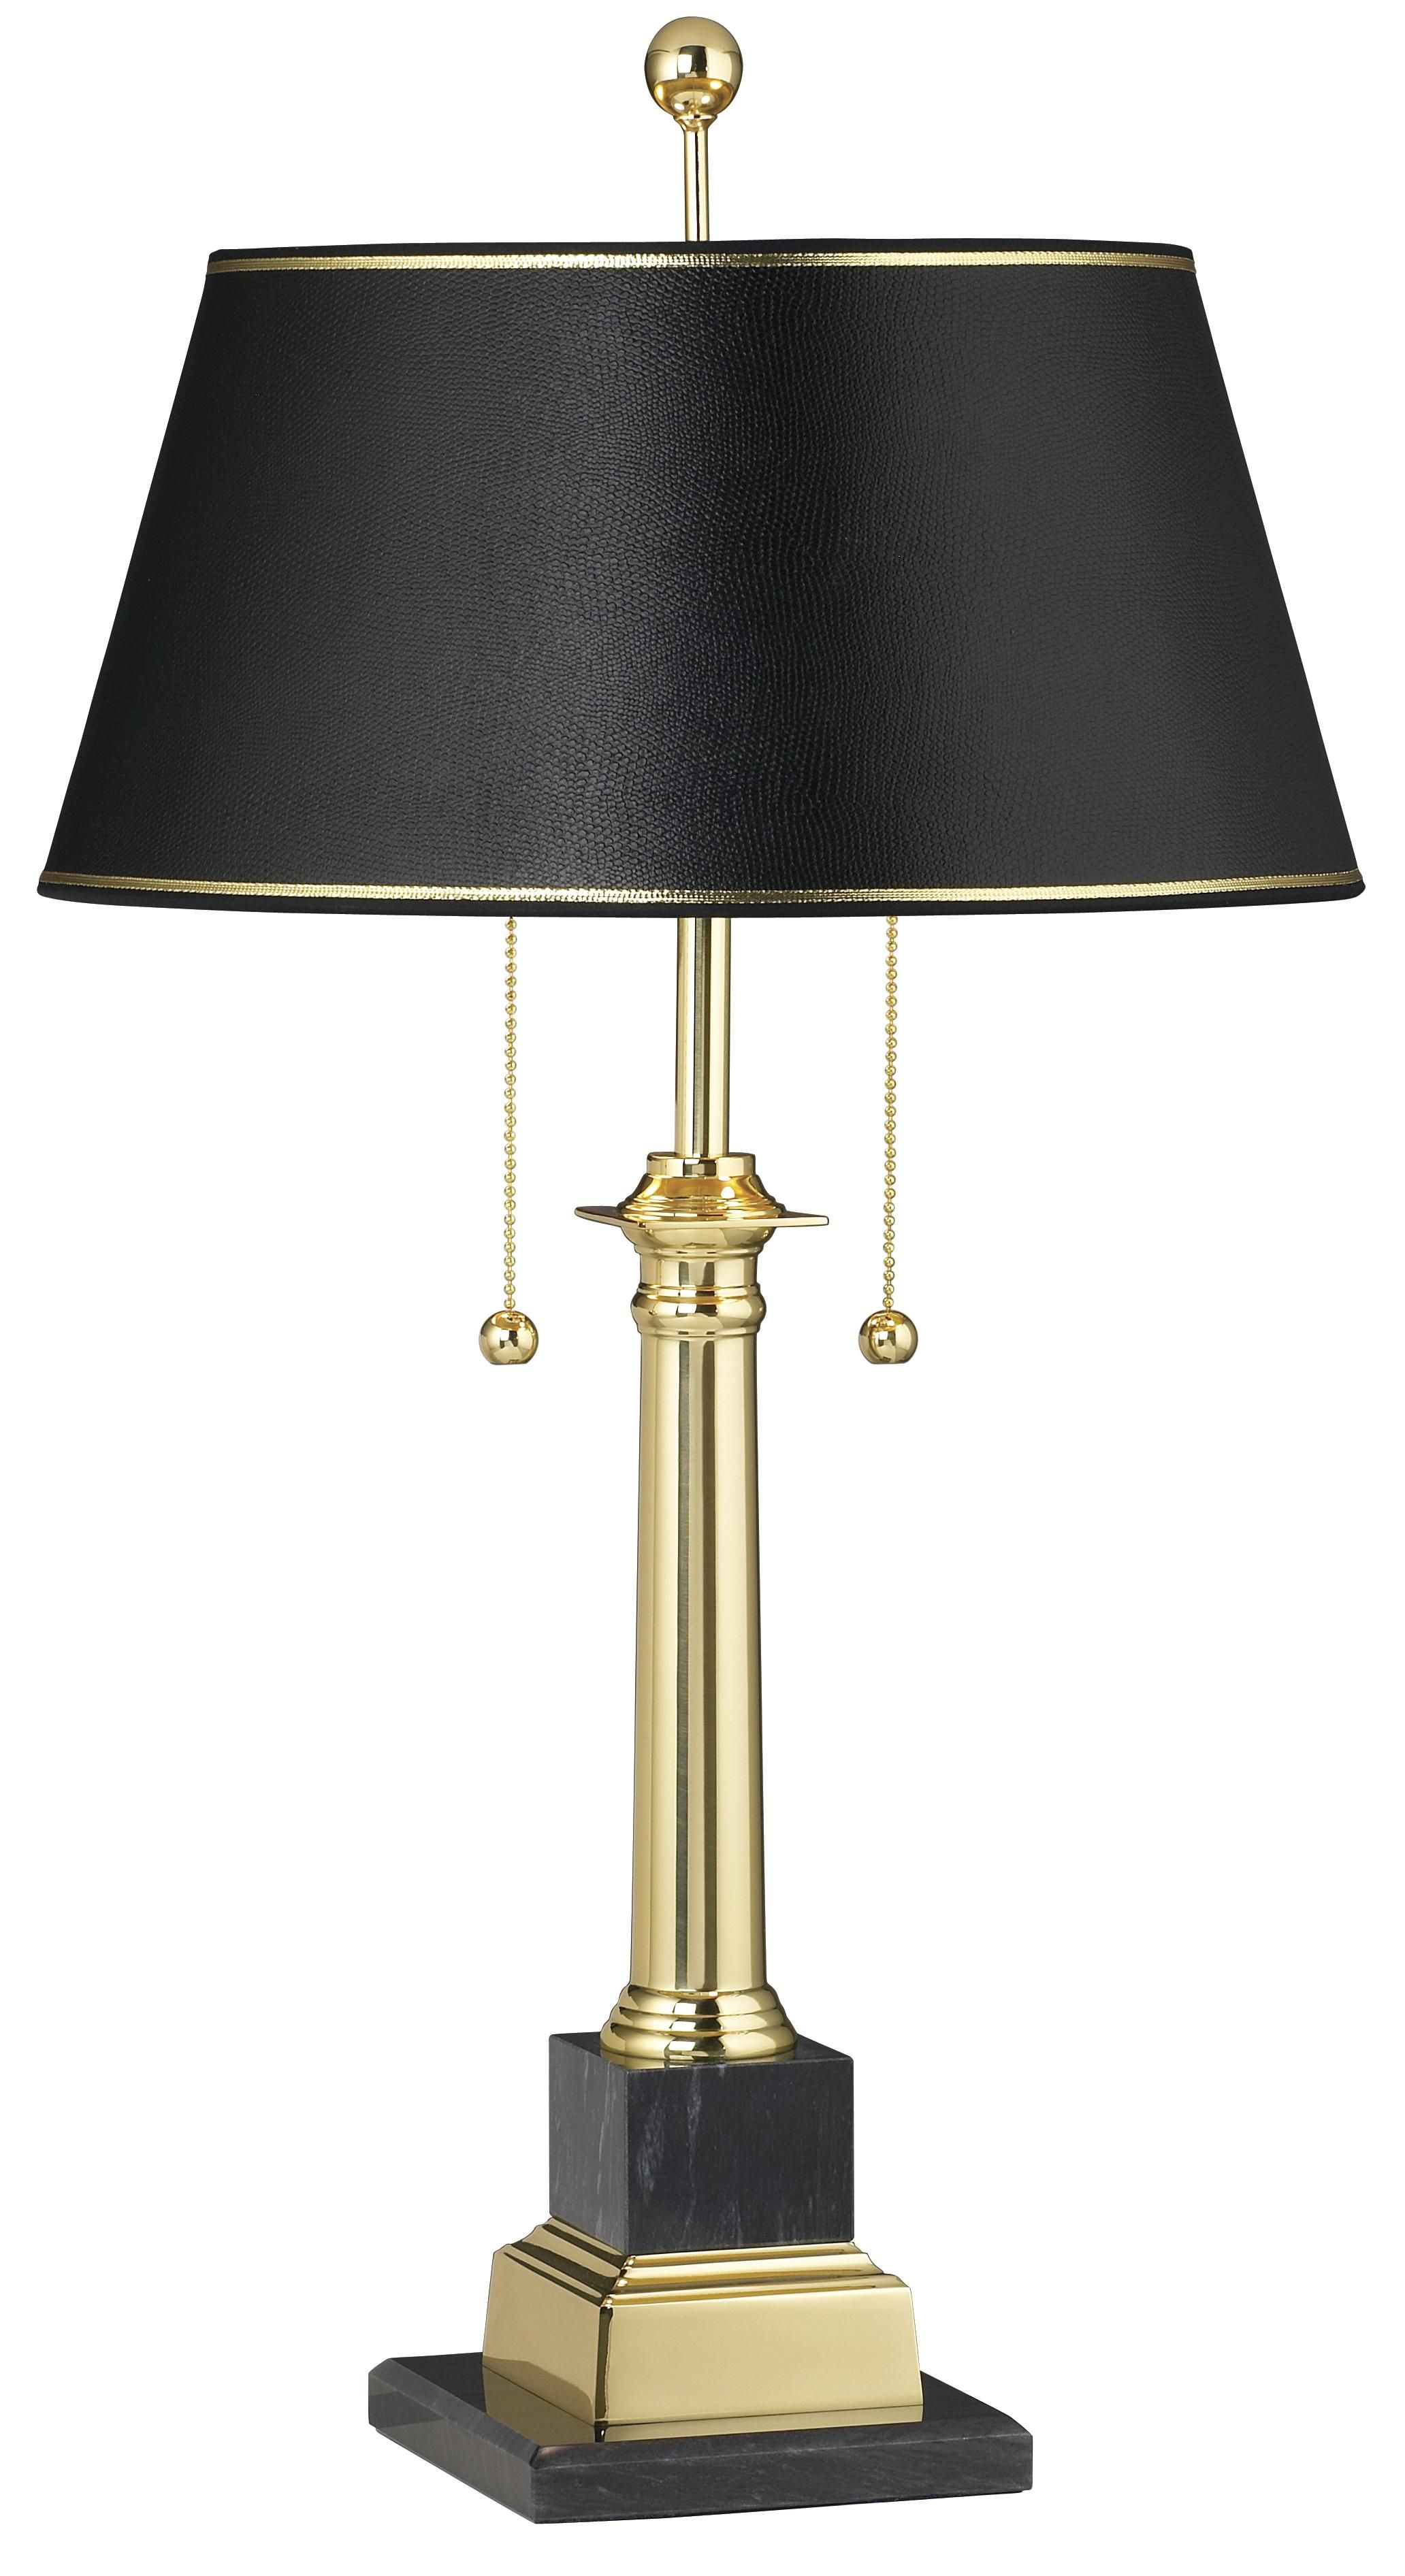 Georgetown Solid Brass Desk Lamp 10868 Lamps Plus Brass Desk Lamp Traditional Desk Lamps Traditional Table Lamps